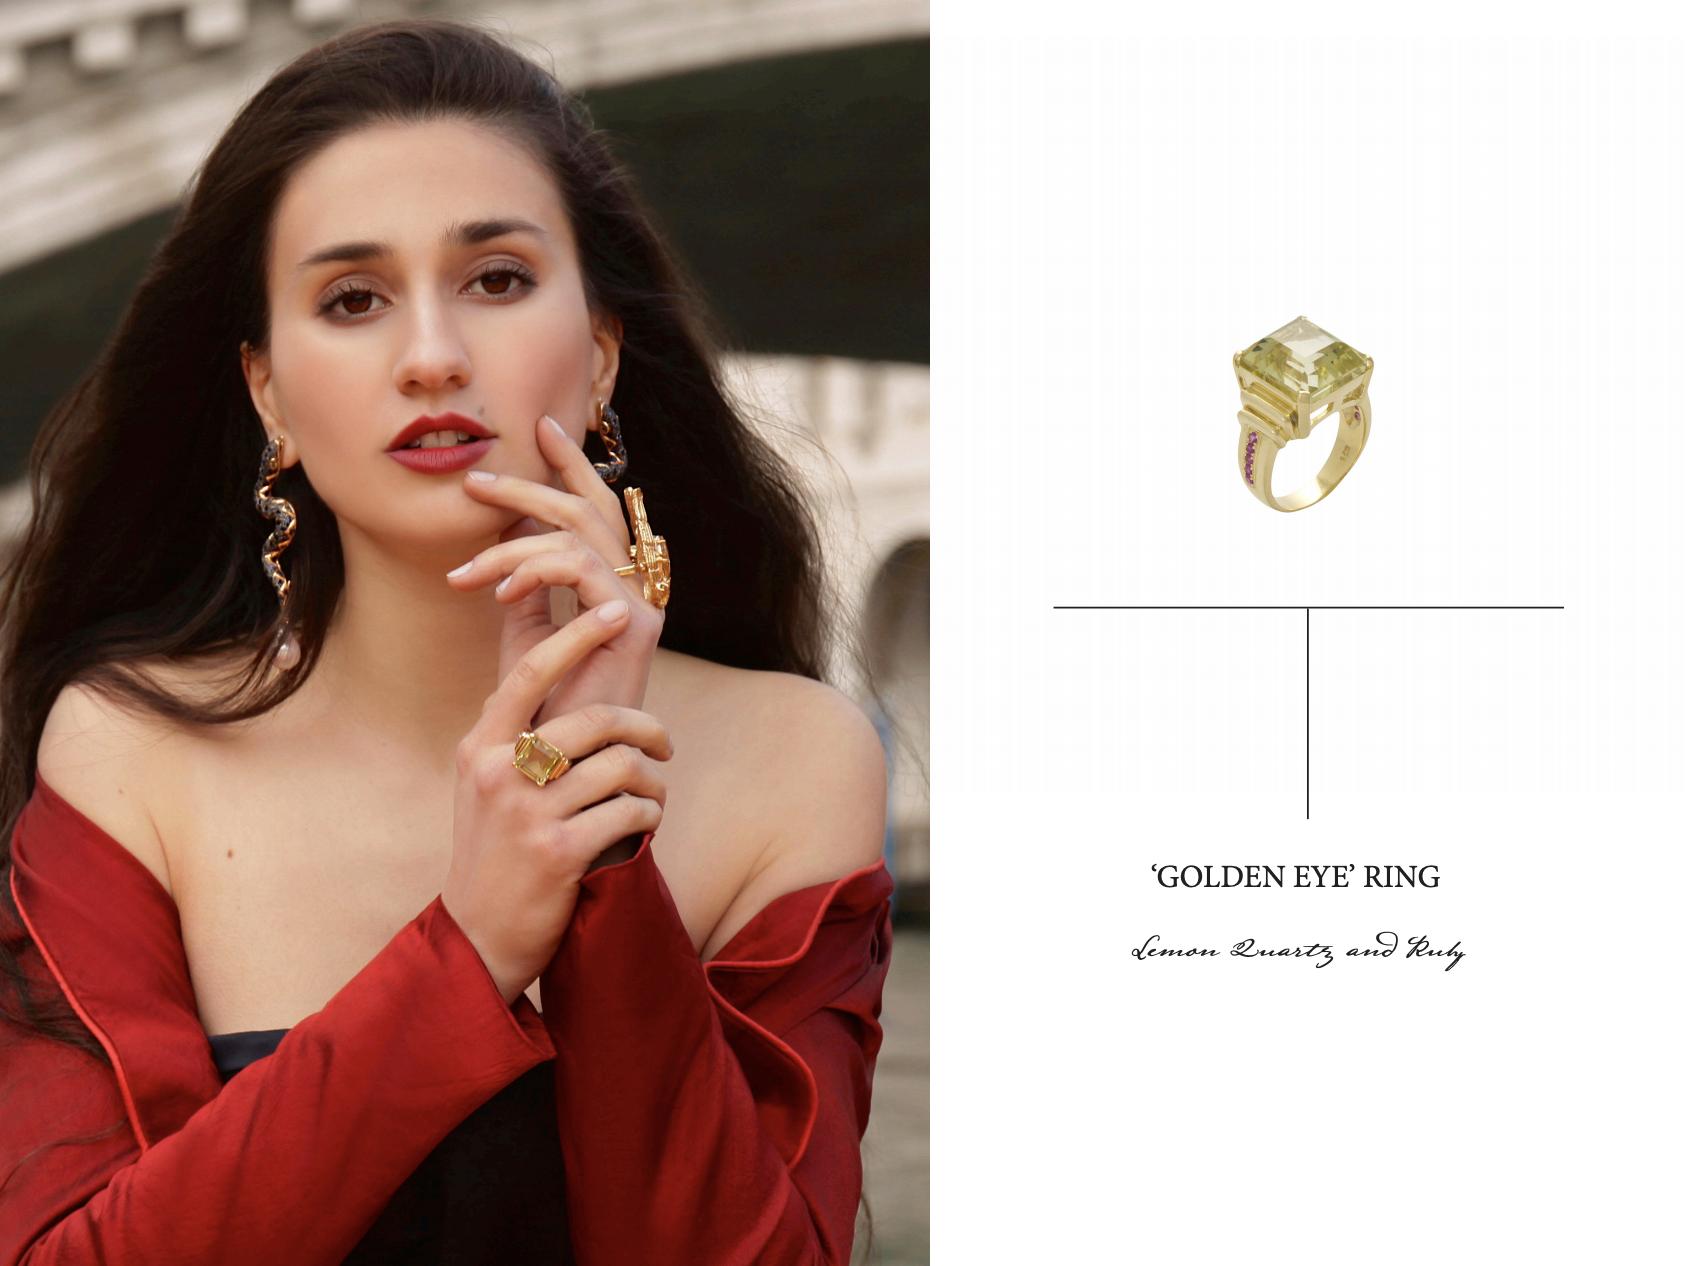 republic of toma jewelry - press kit design sarah pottharst 16.png